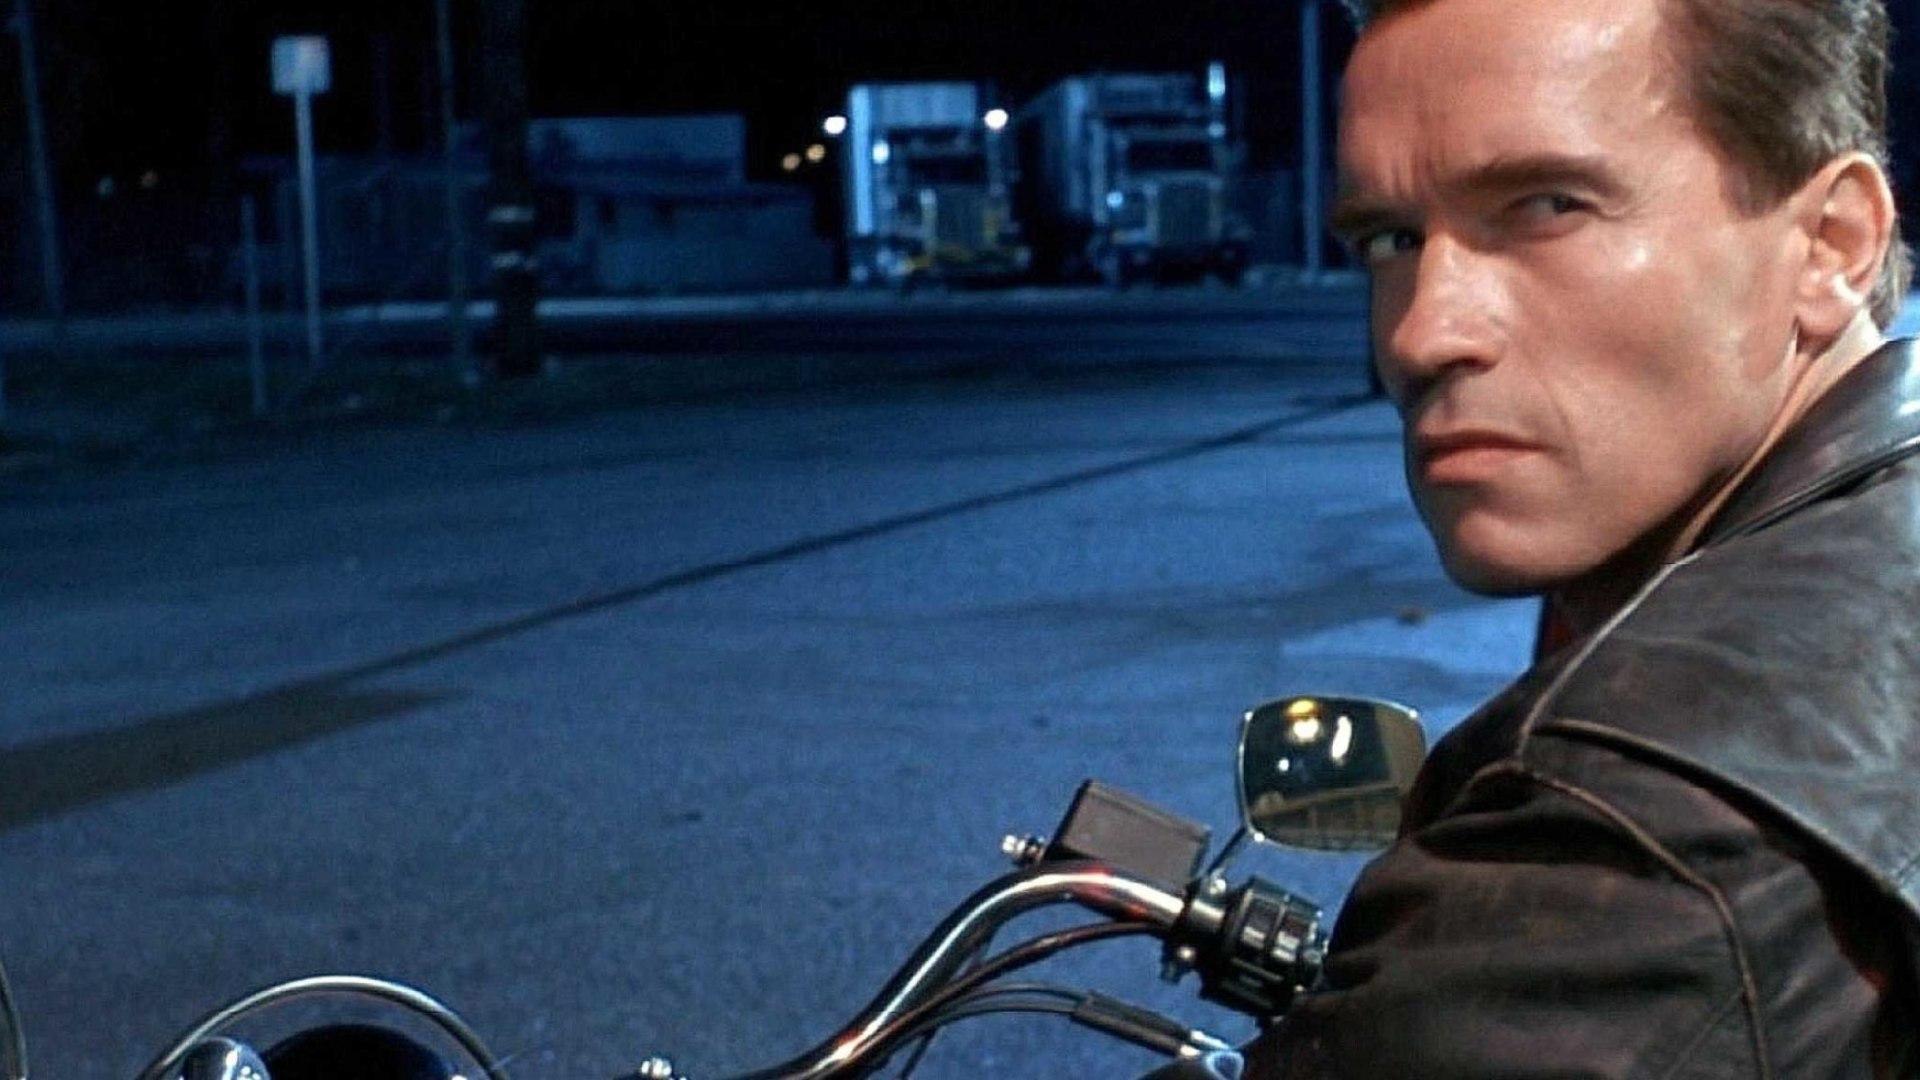 Spike Terminator